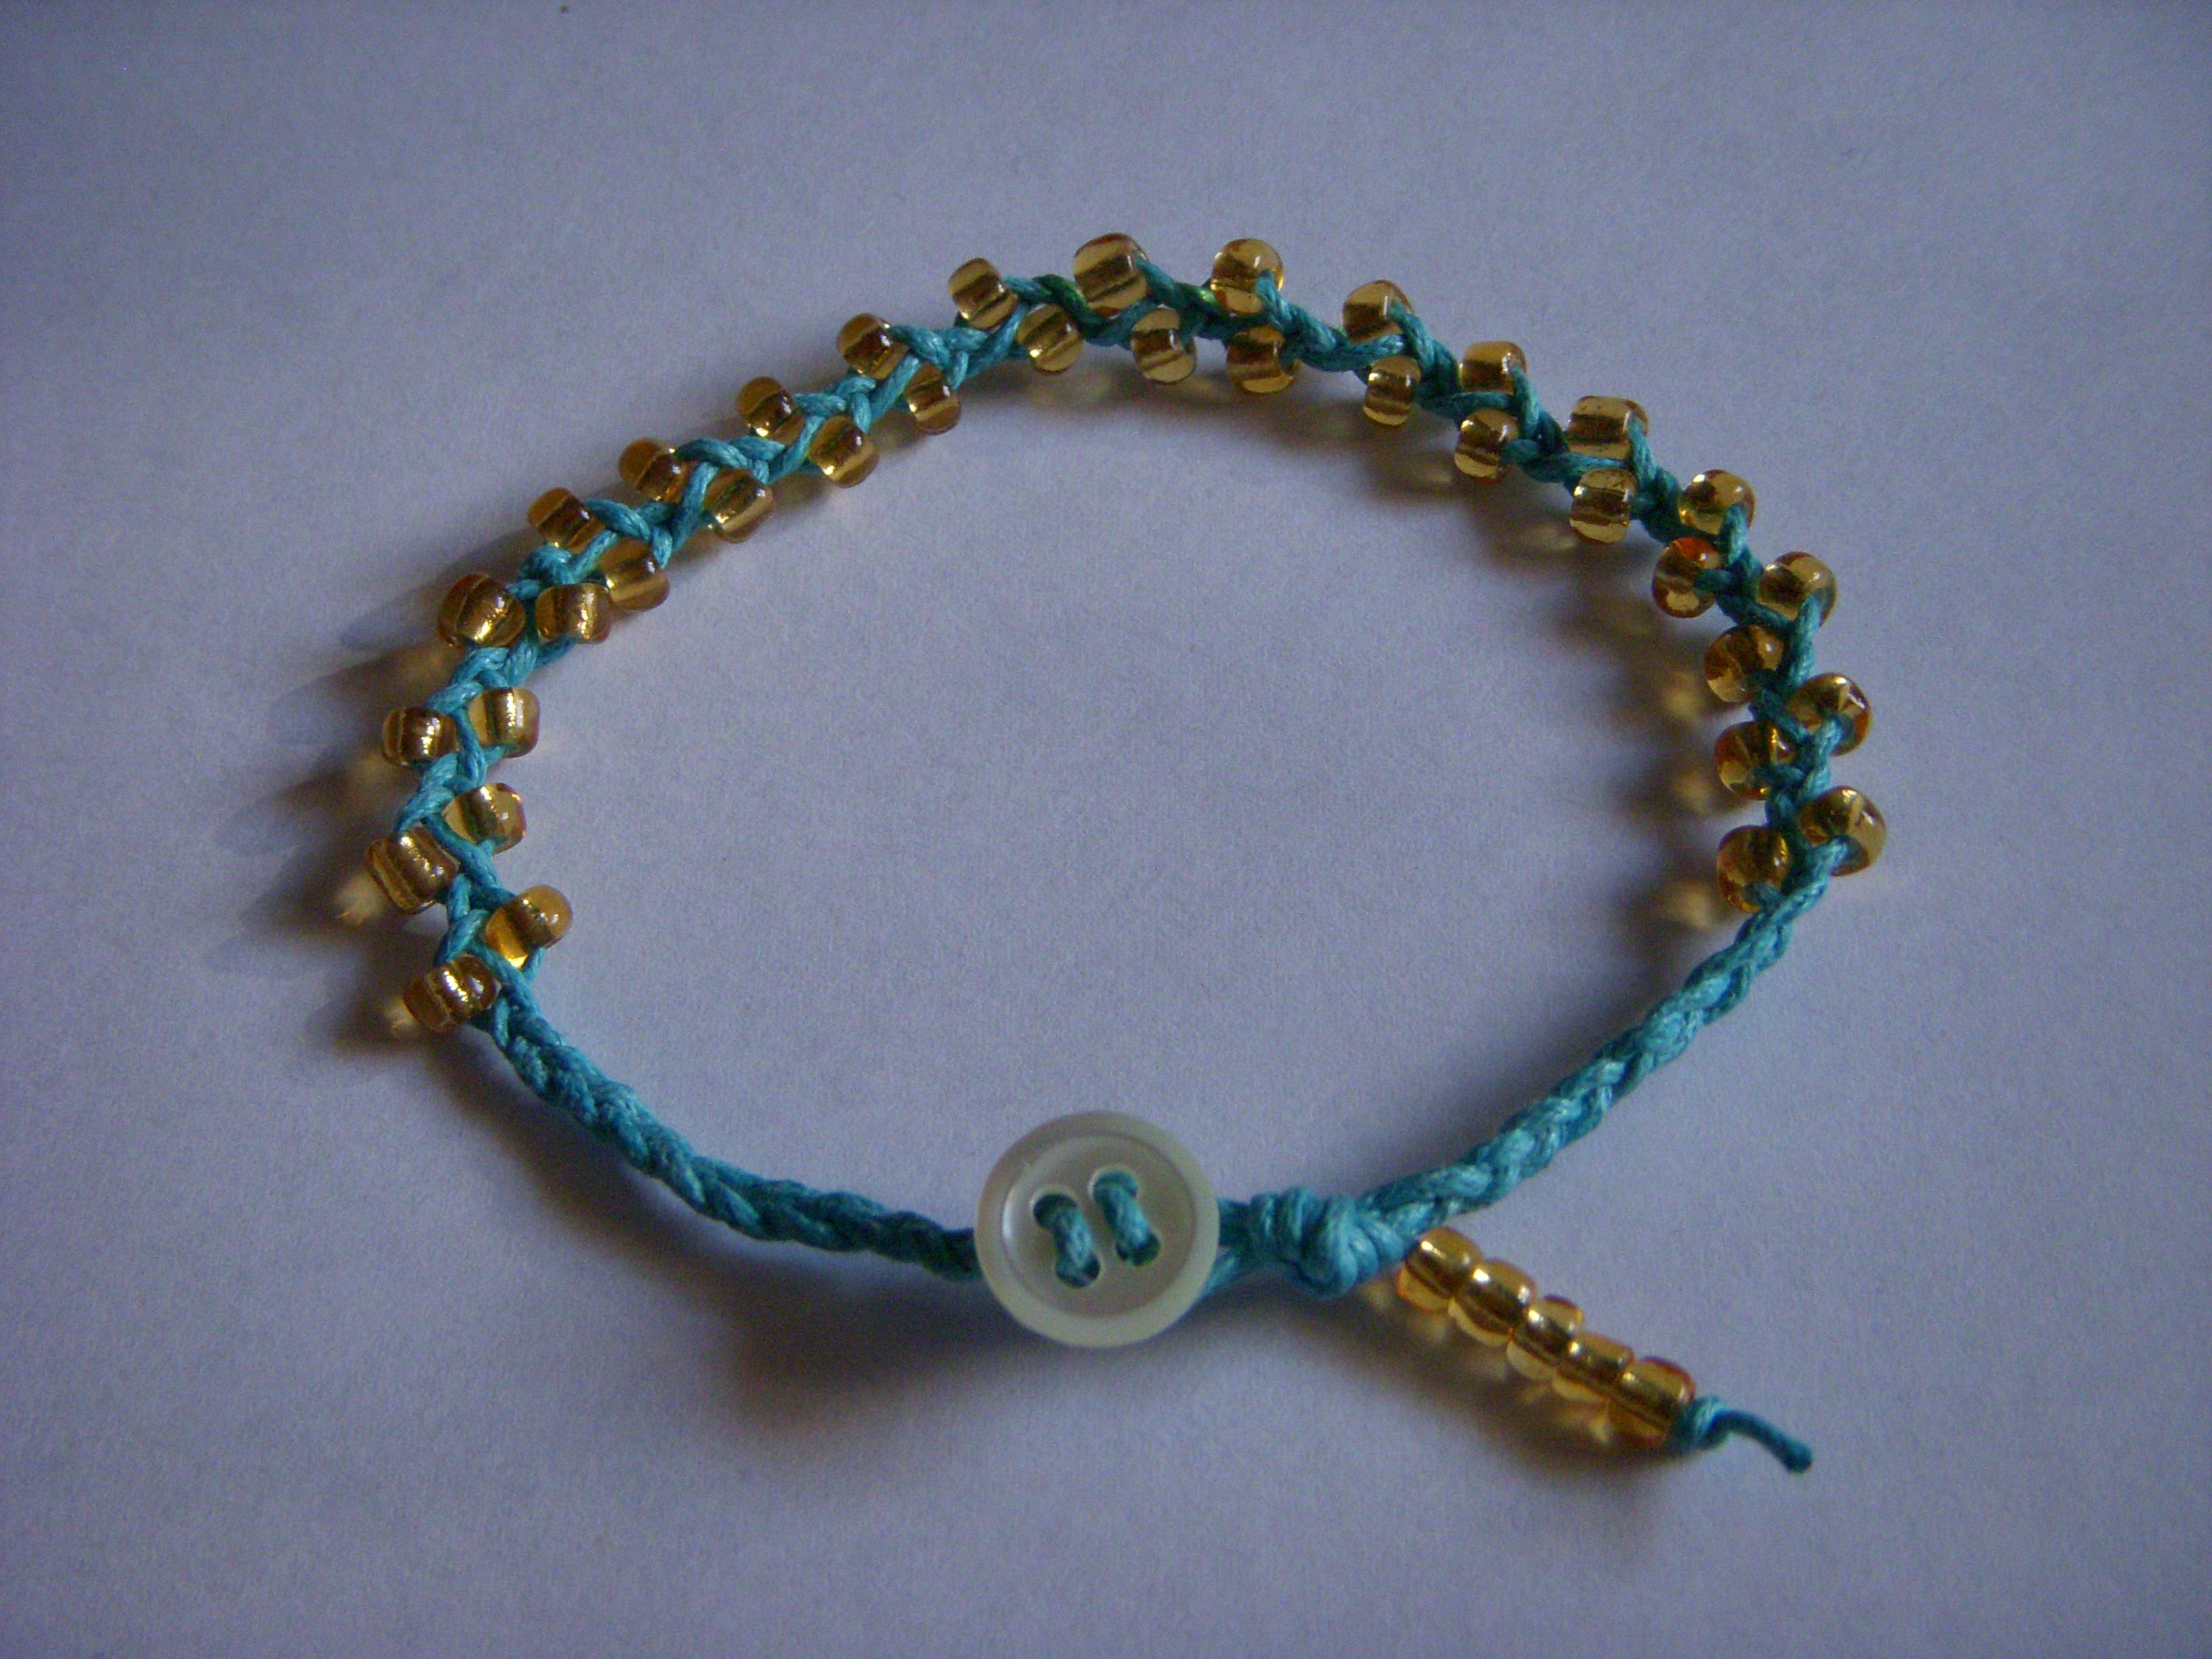 Braided bead and bead bracelet 24